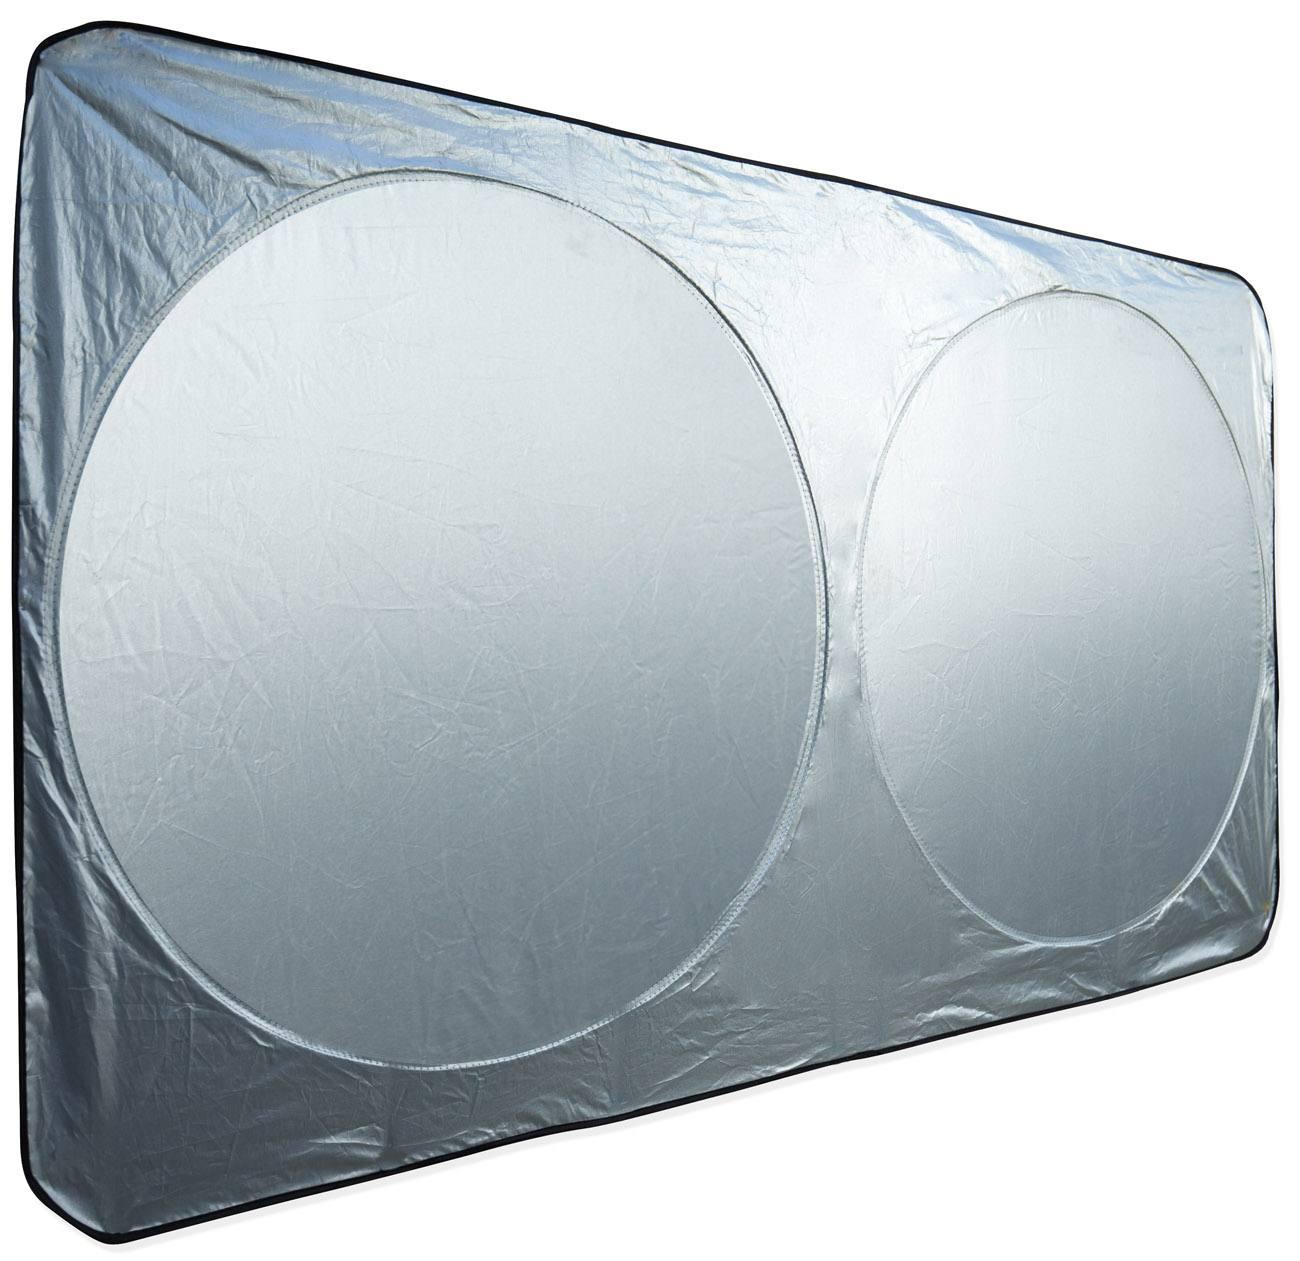 Best Budget  OxGord Foldable Auto Sun Shade bf5b76131ba1